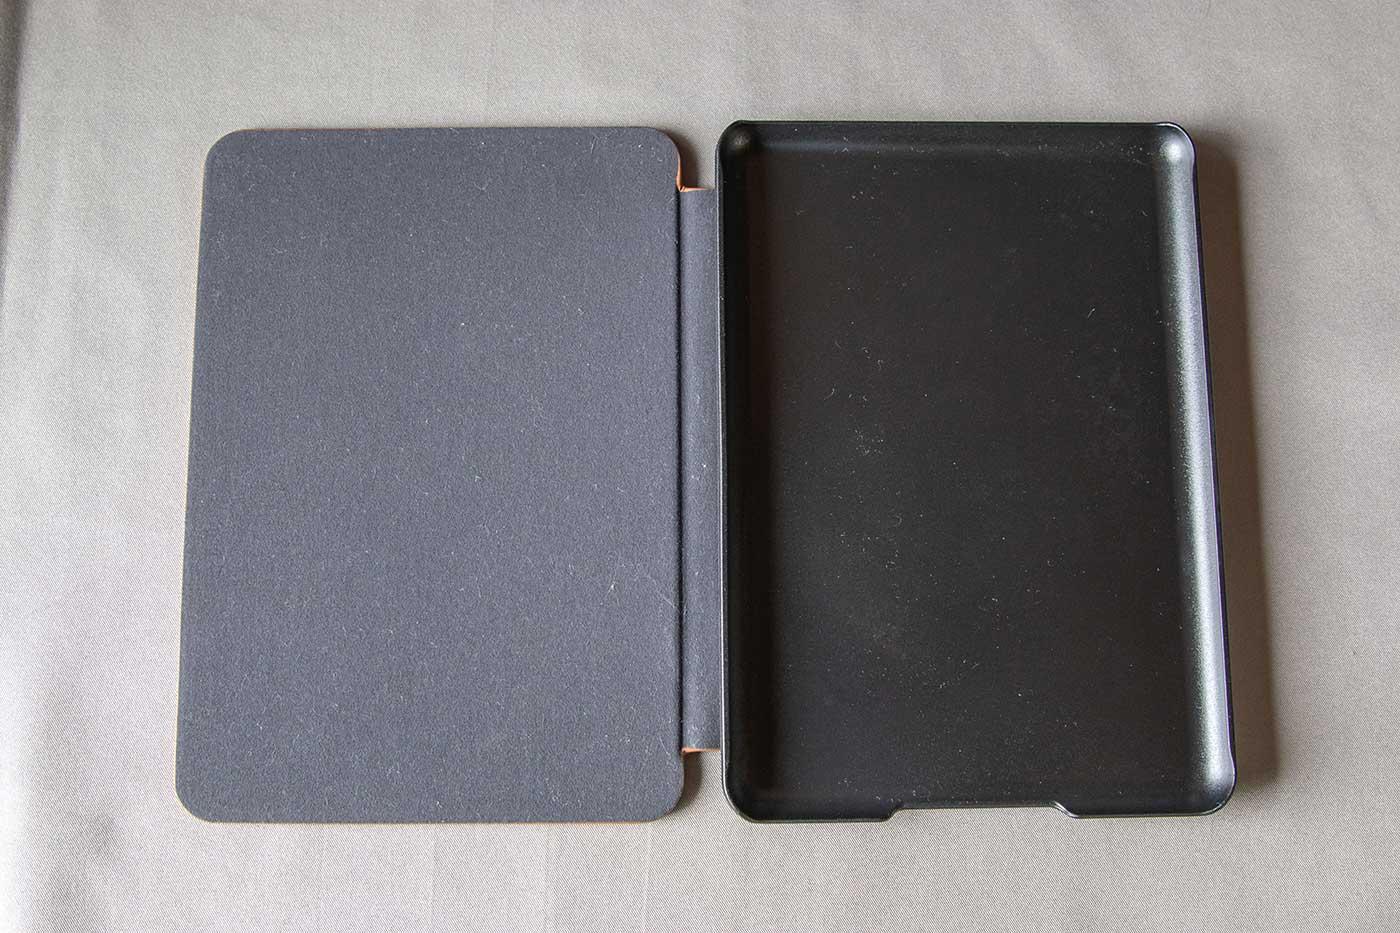 KindlePaperwhiteの非純正カバー